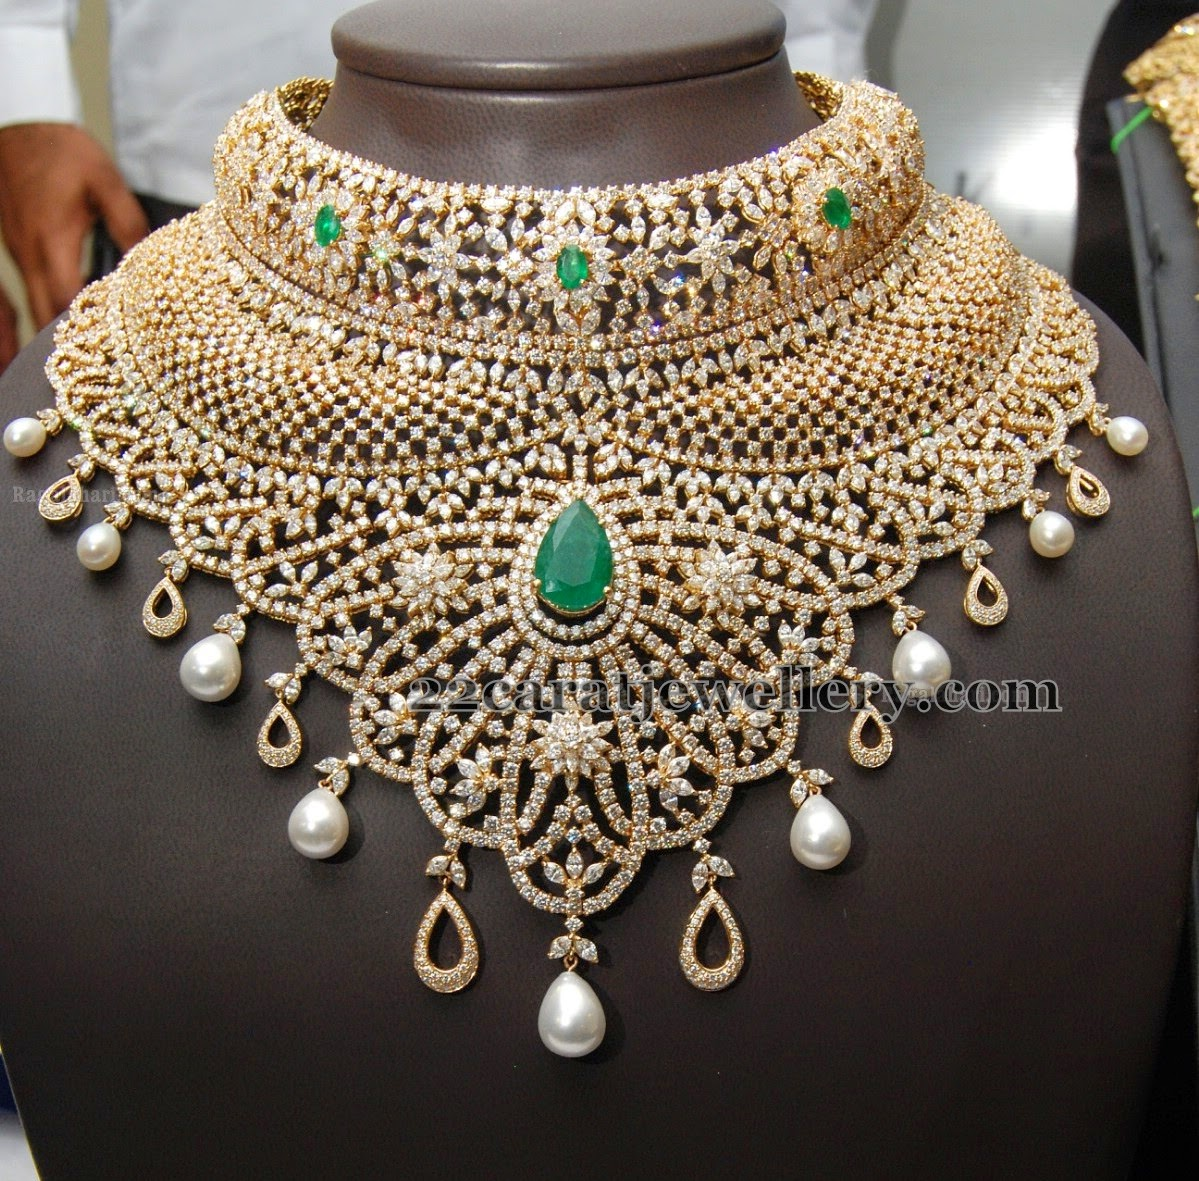 Kirtilals Large Diamond Necklace